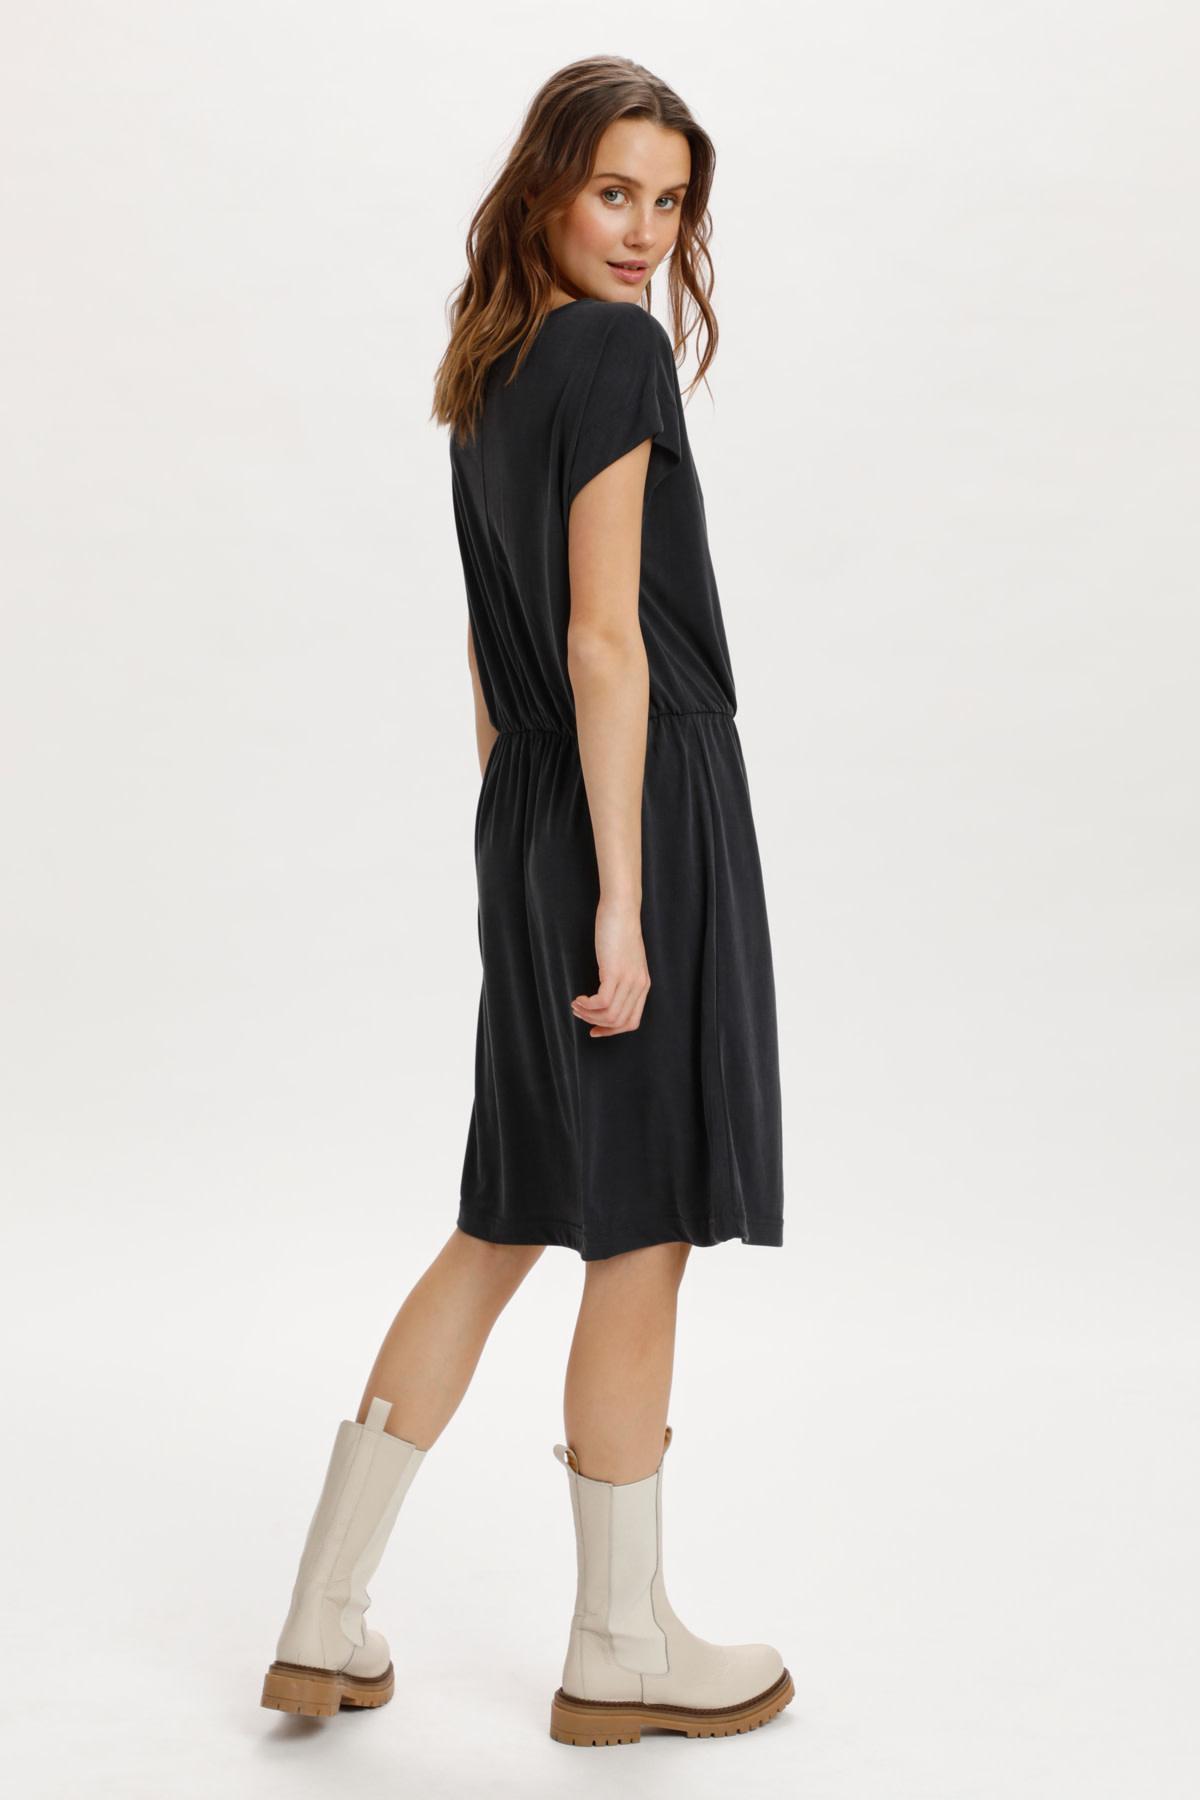 Fabiola Dress